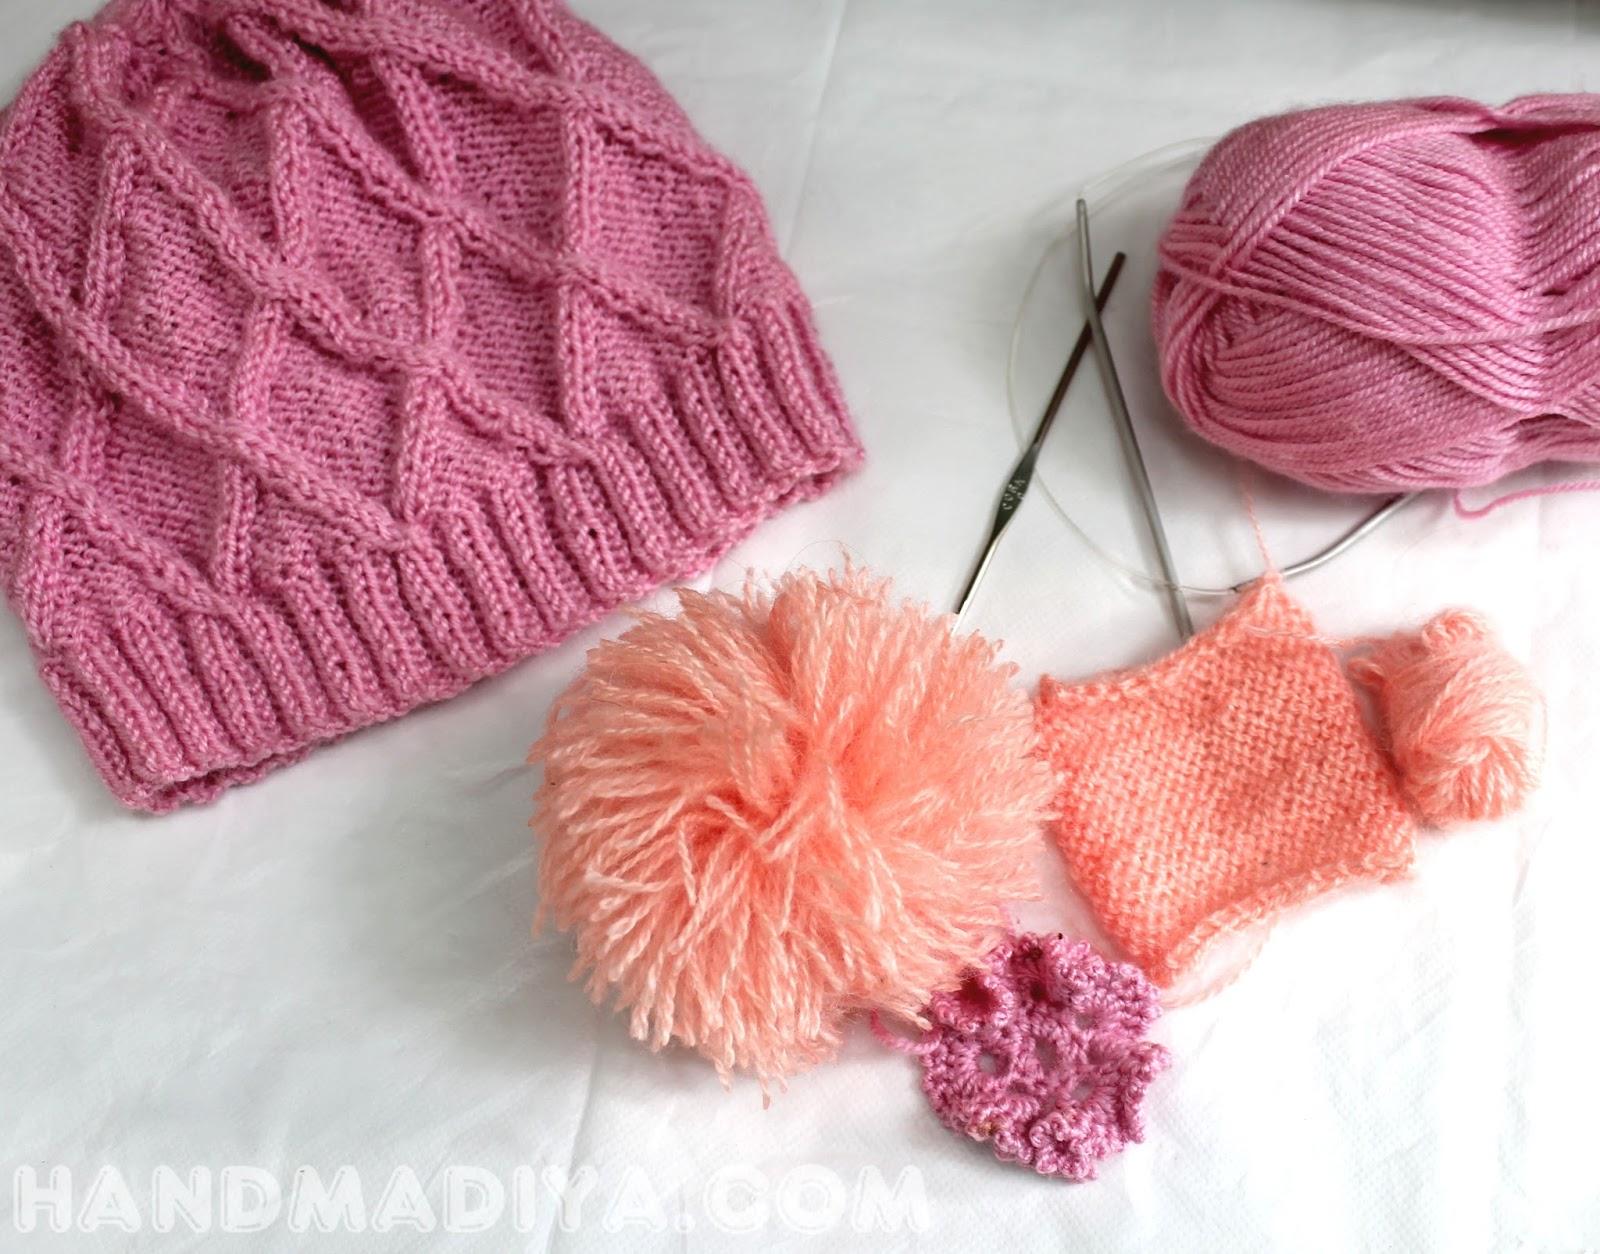 связала шапочку для девочки.  cap for girls, knitting